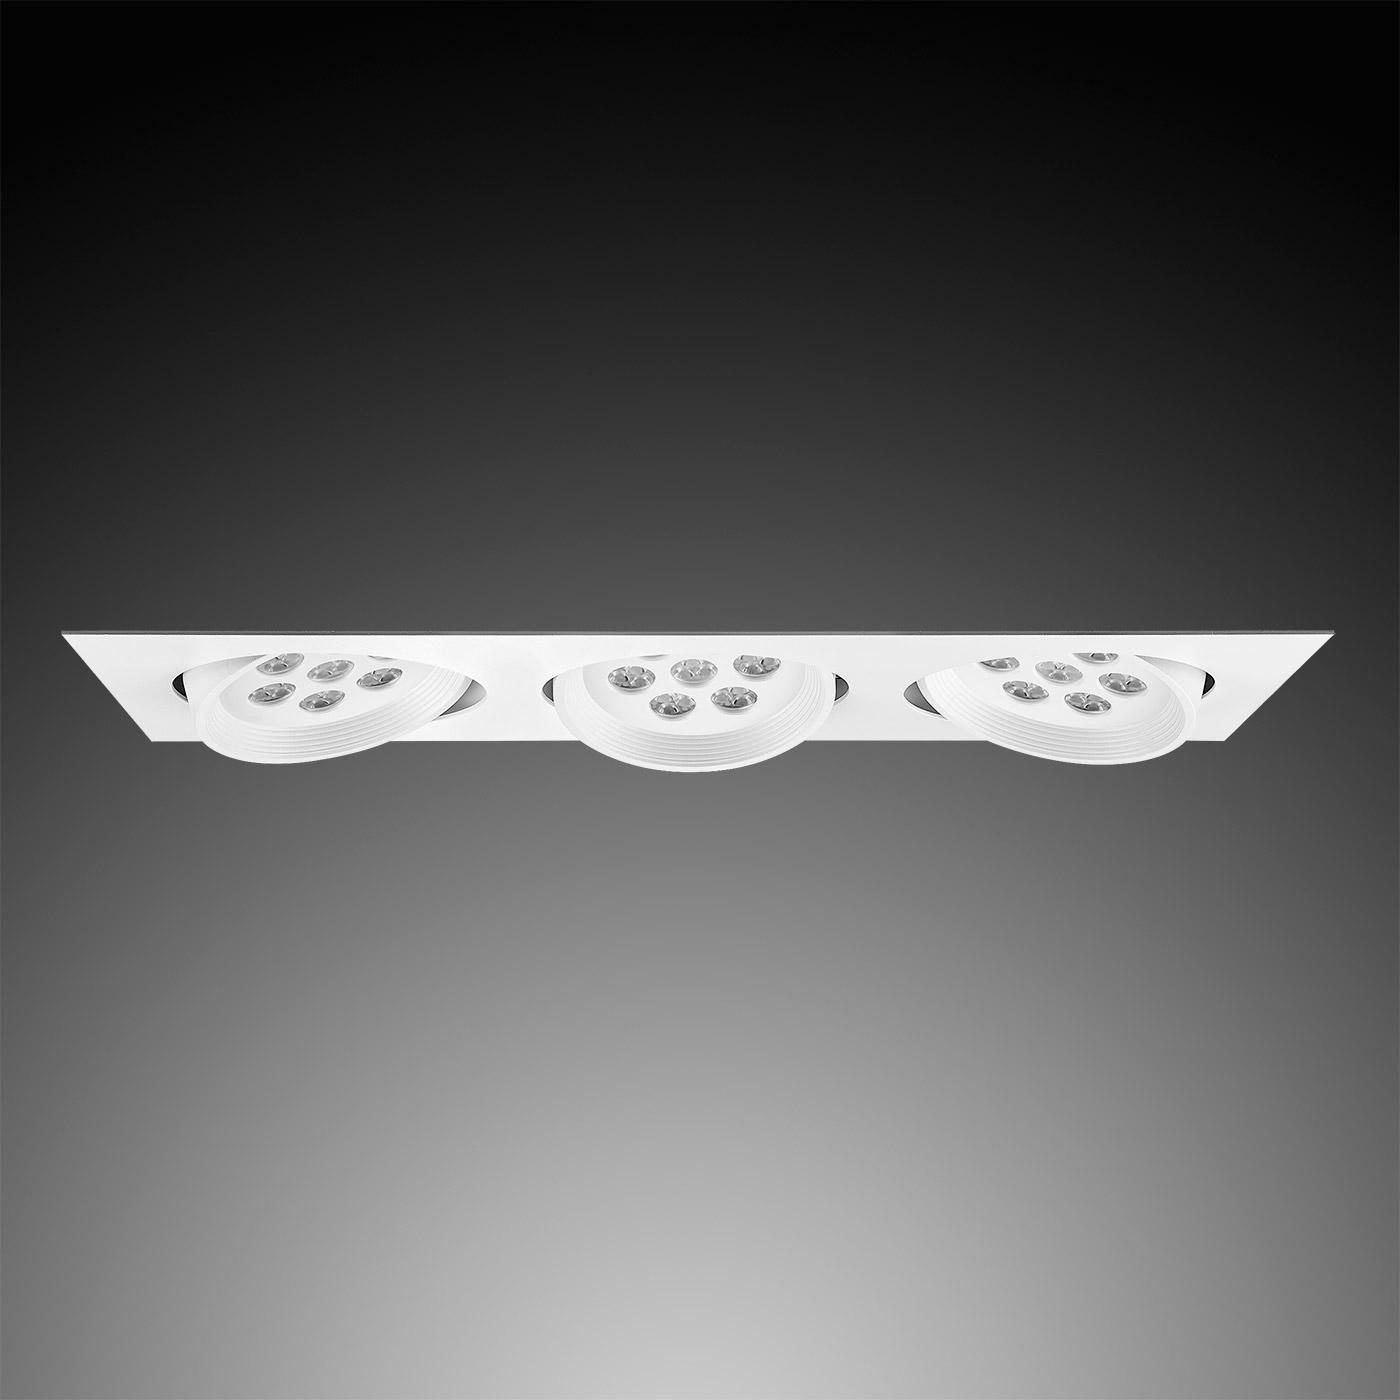 STAR | LAMP83 - Effiziente Beleuchtungssysteme